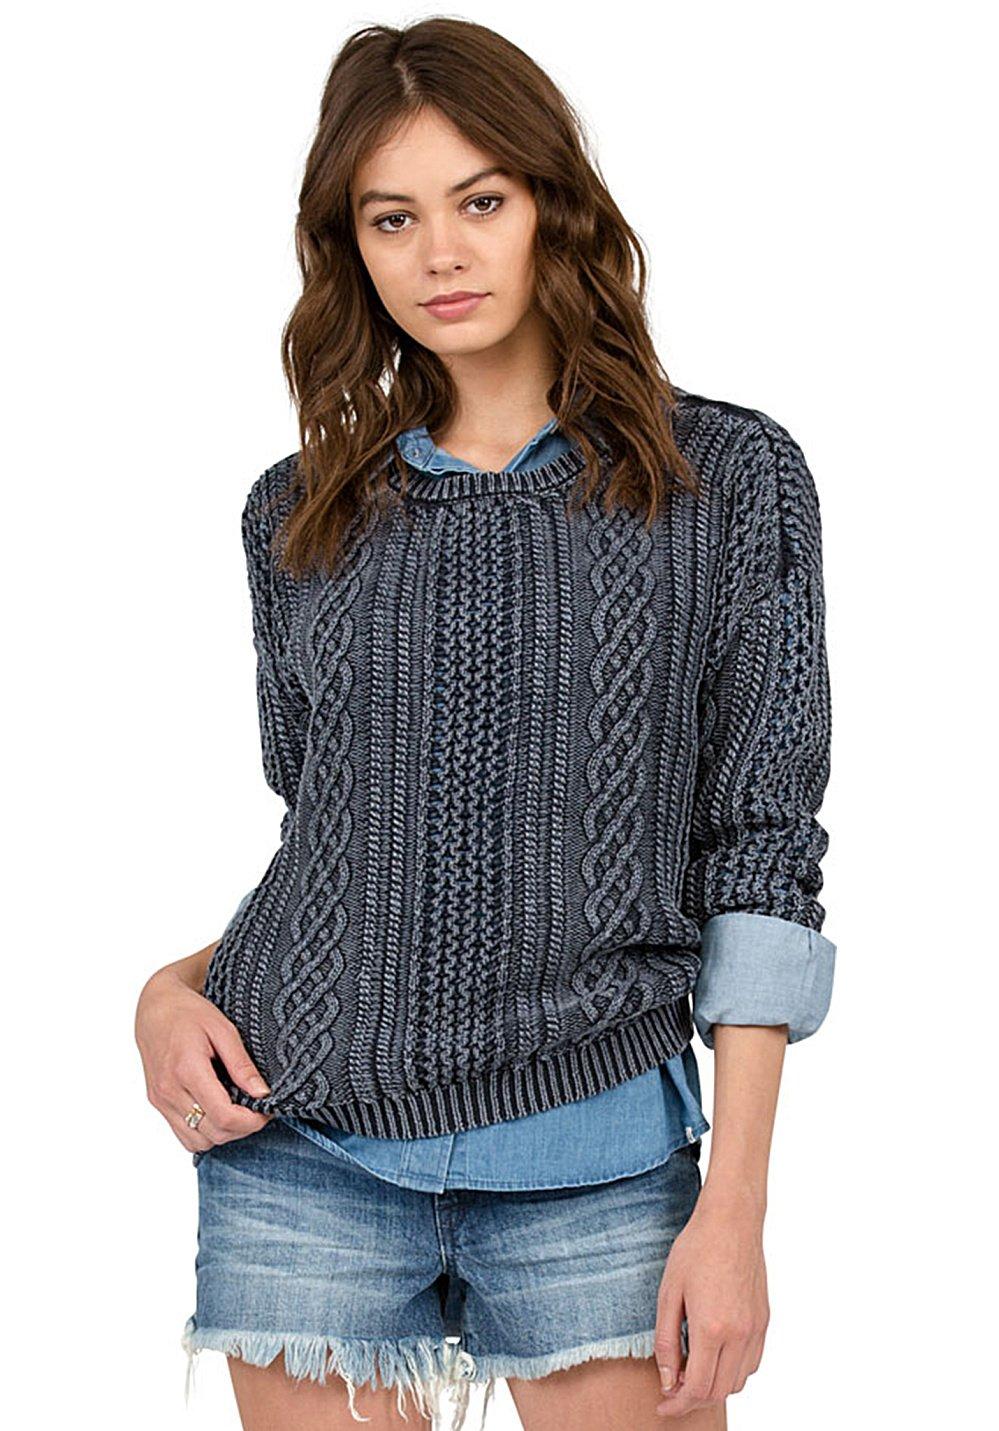 Volcom Damen Mess Round Crew Pulli Pullover Blau Sweatshirt